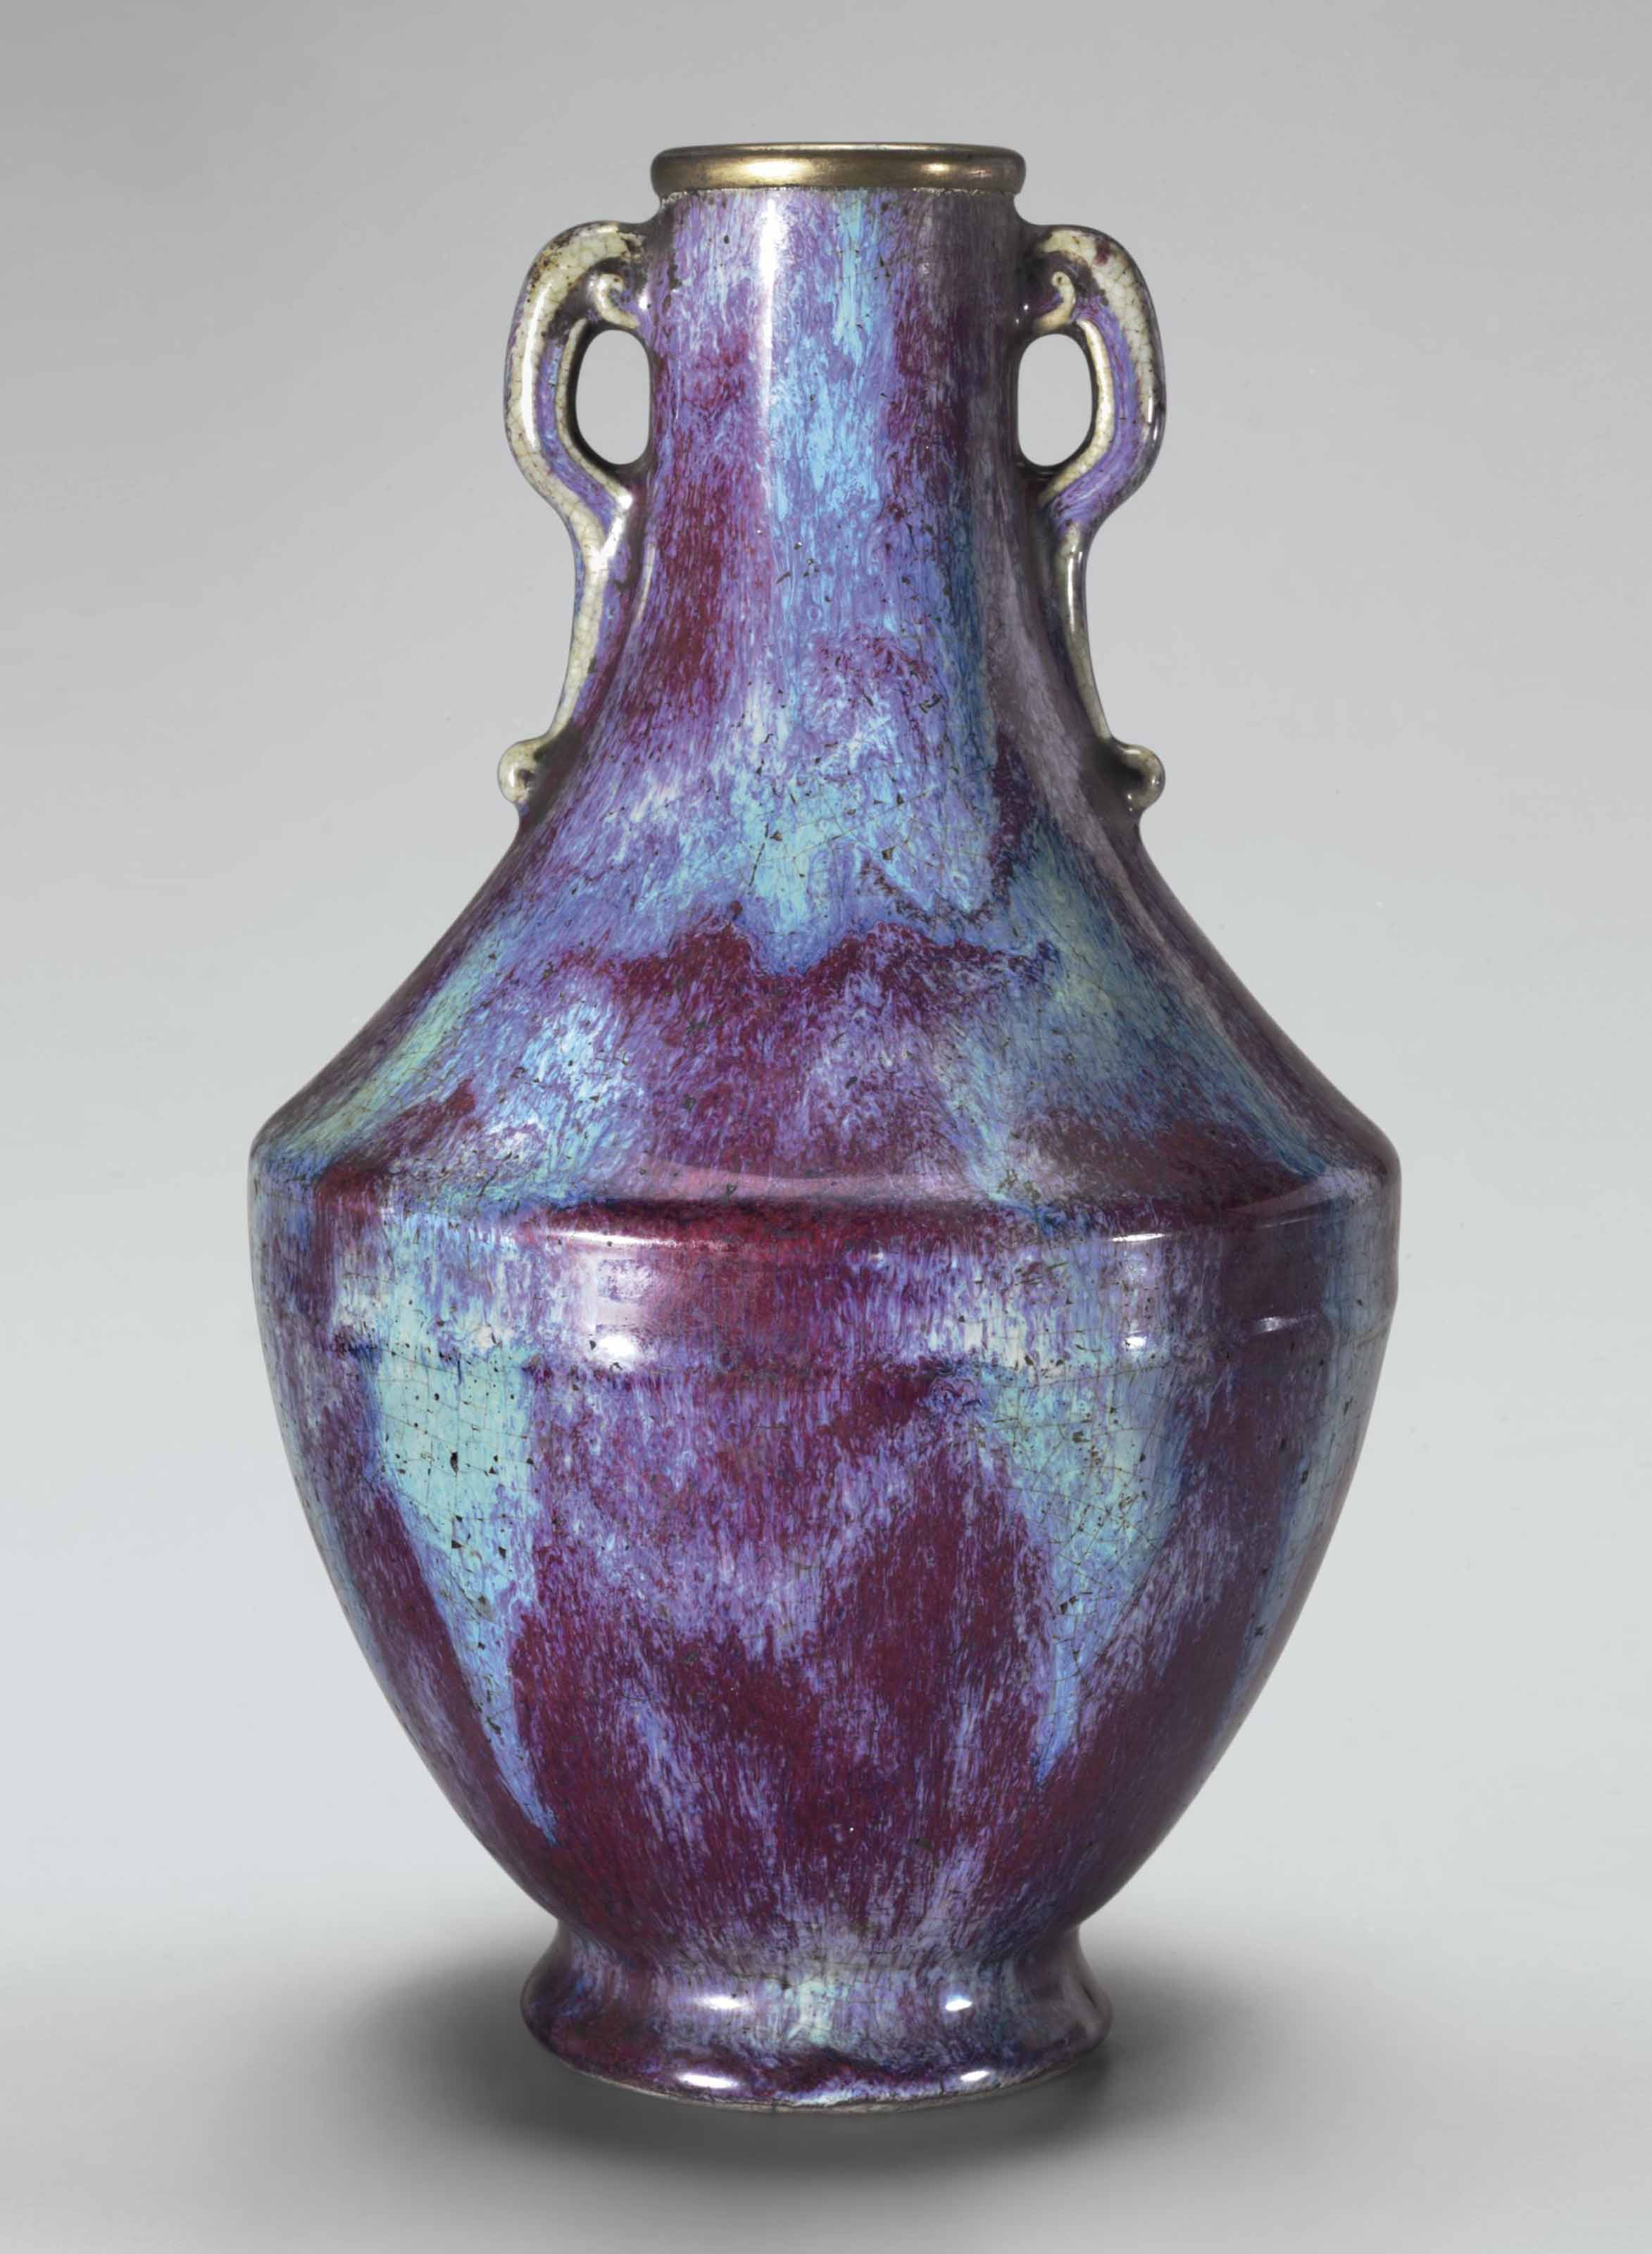 Incised vase Vase with incised sides.